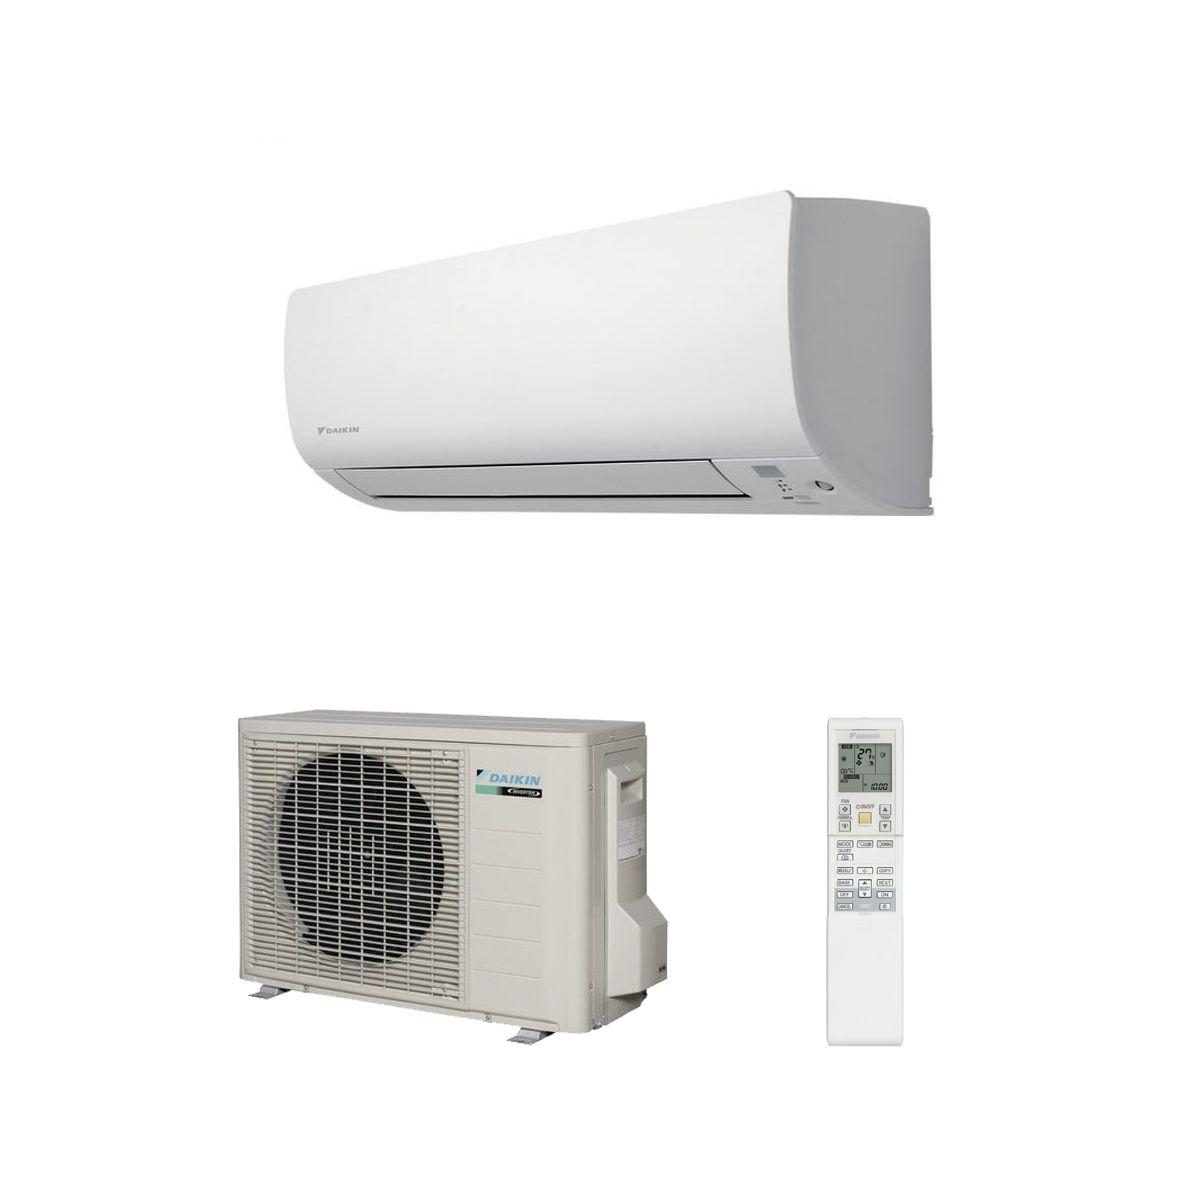 Daikin Air Conditioning FTX35KV Wall Mounted Inverter Heat